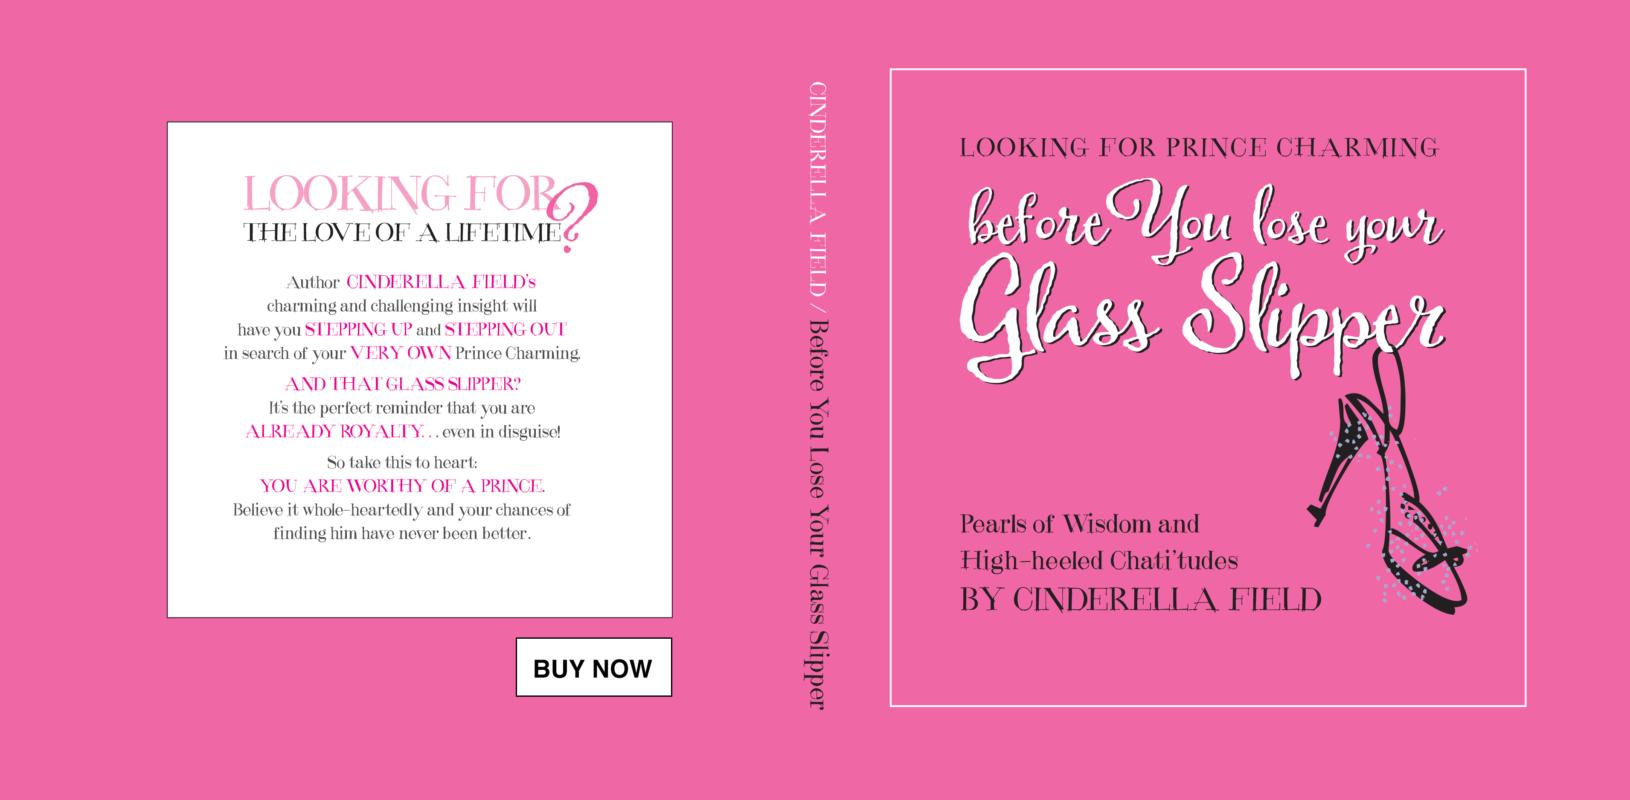 13nov1-glassslipper-cover-for-bookmasters